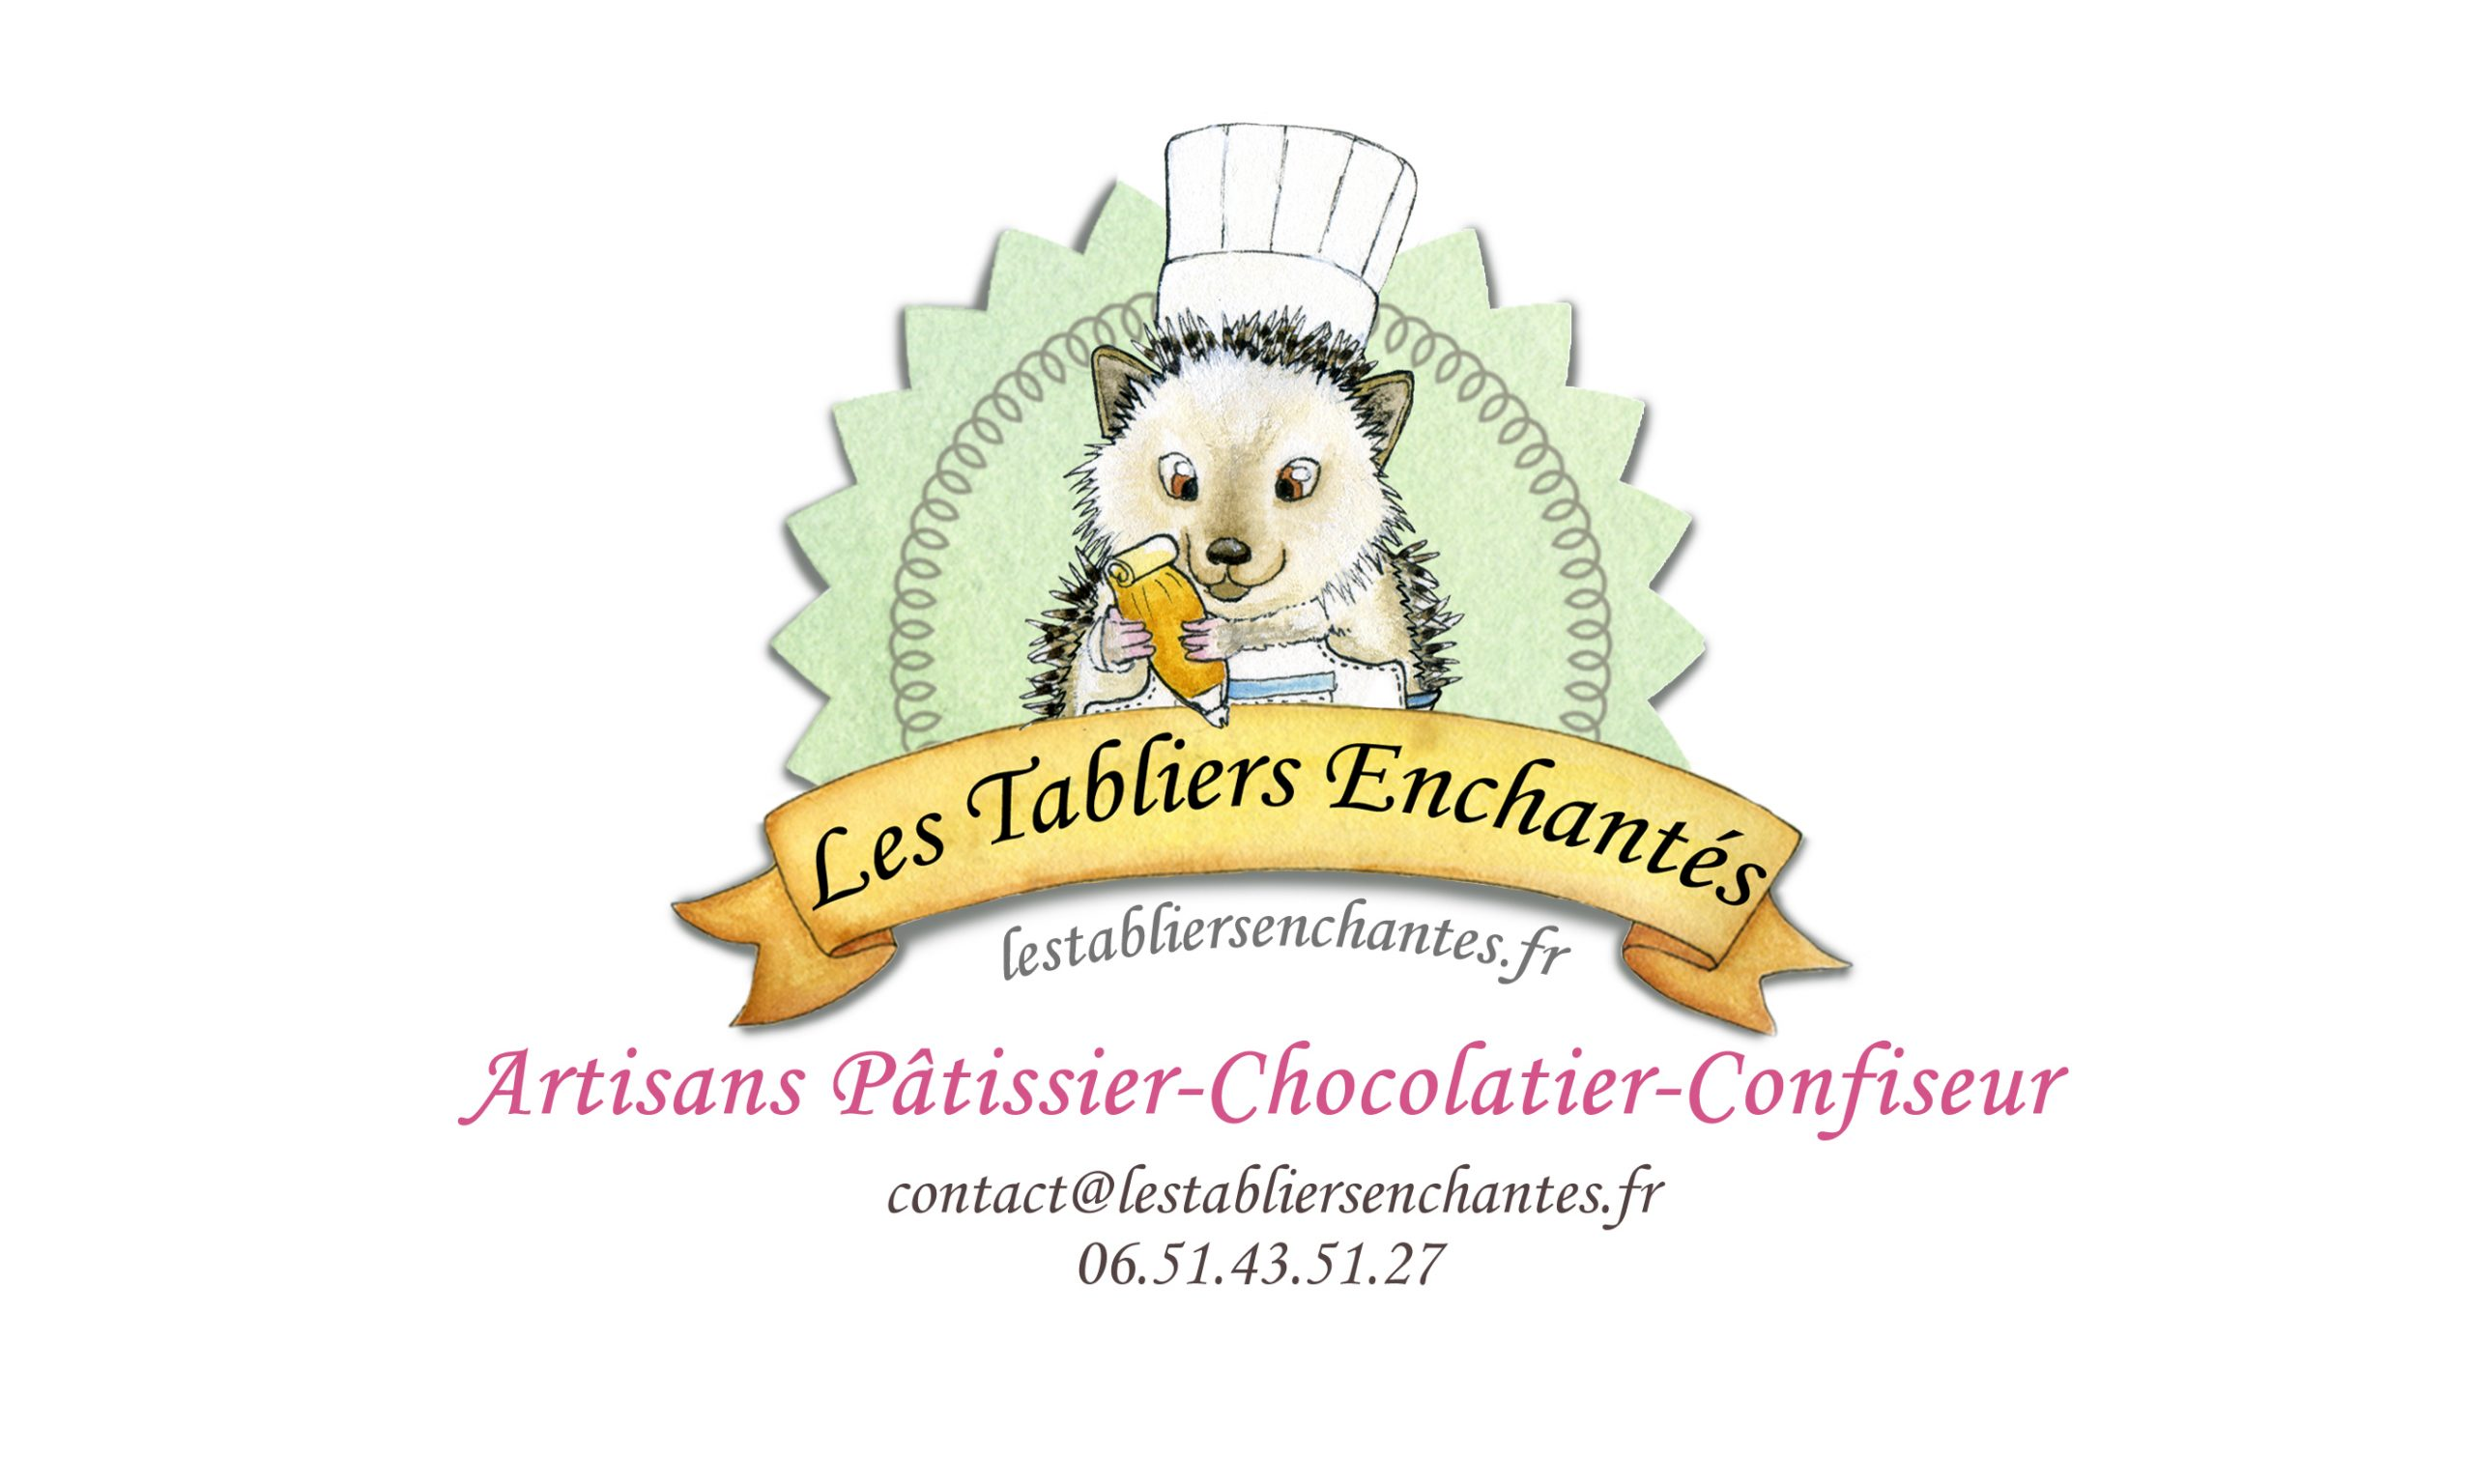 les_tabliers_enchantes_logo